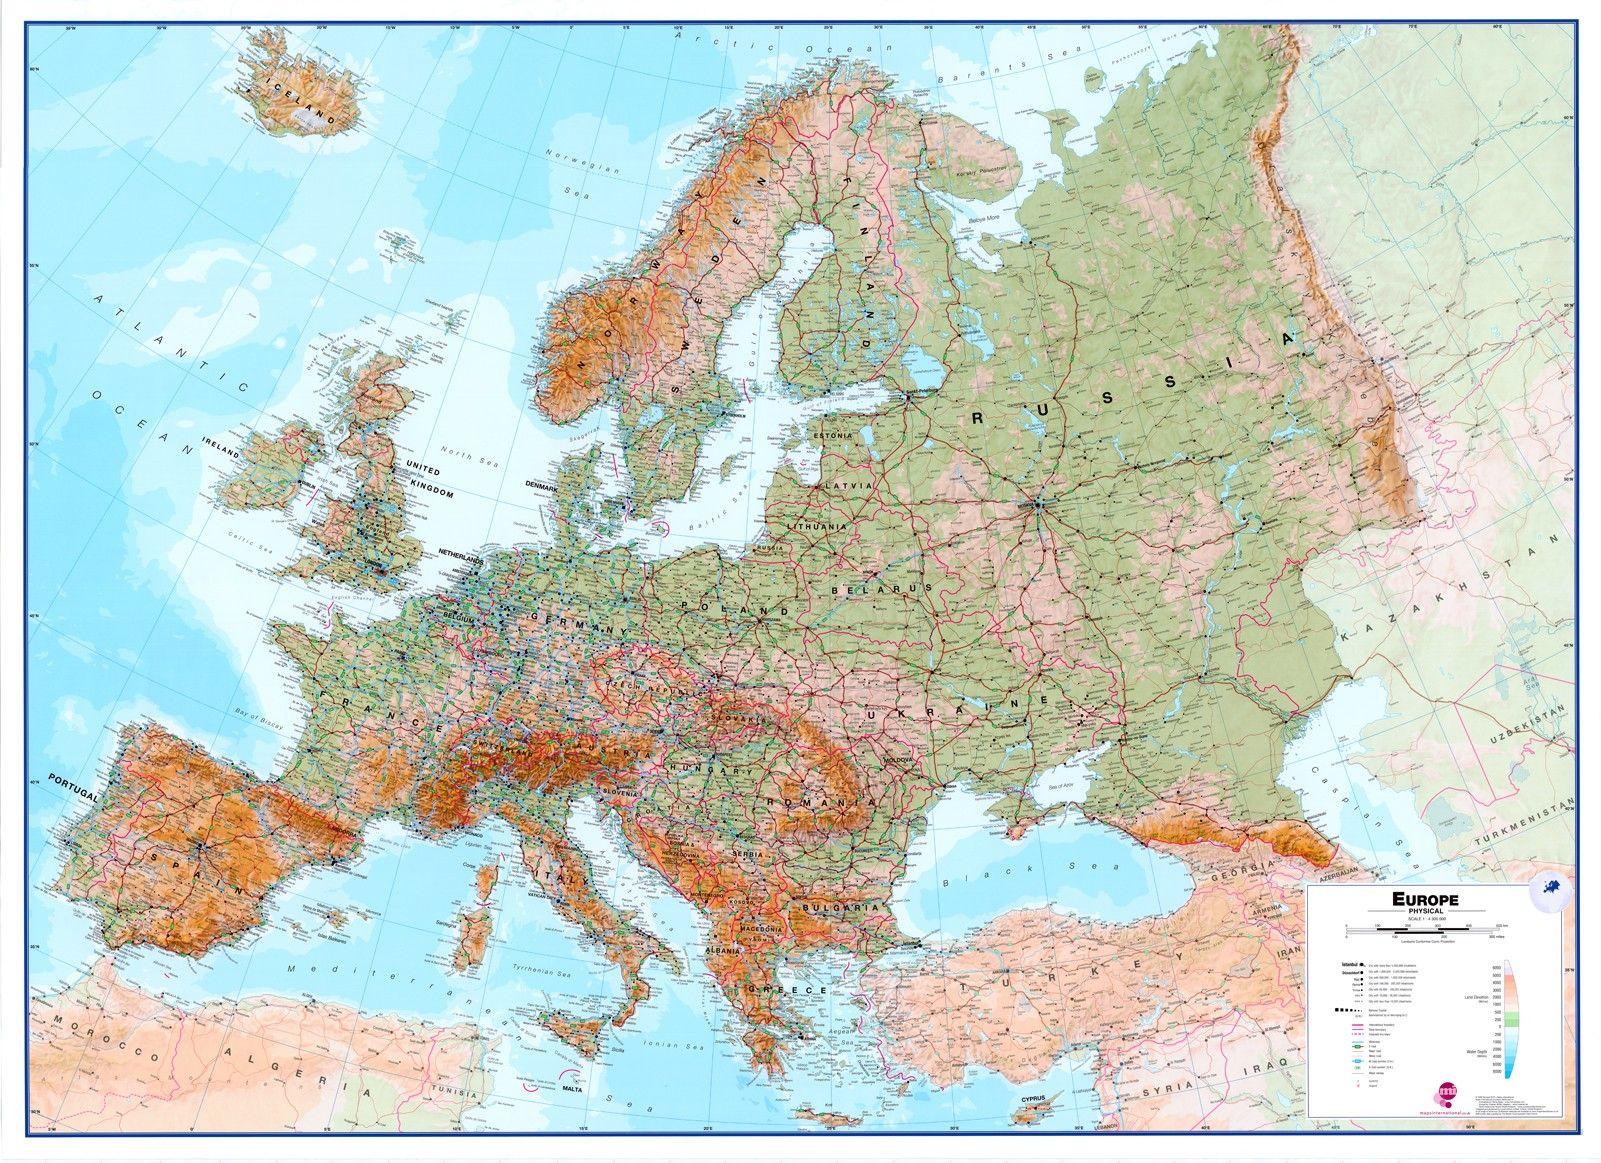 Europakaart A Natuurkundig